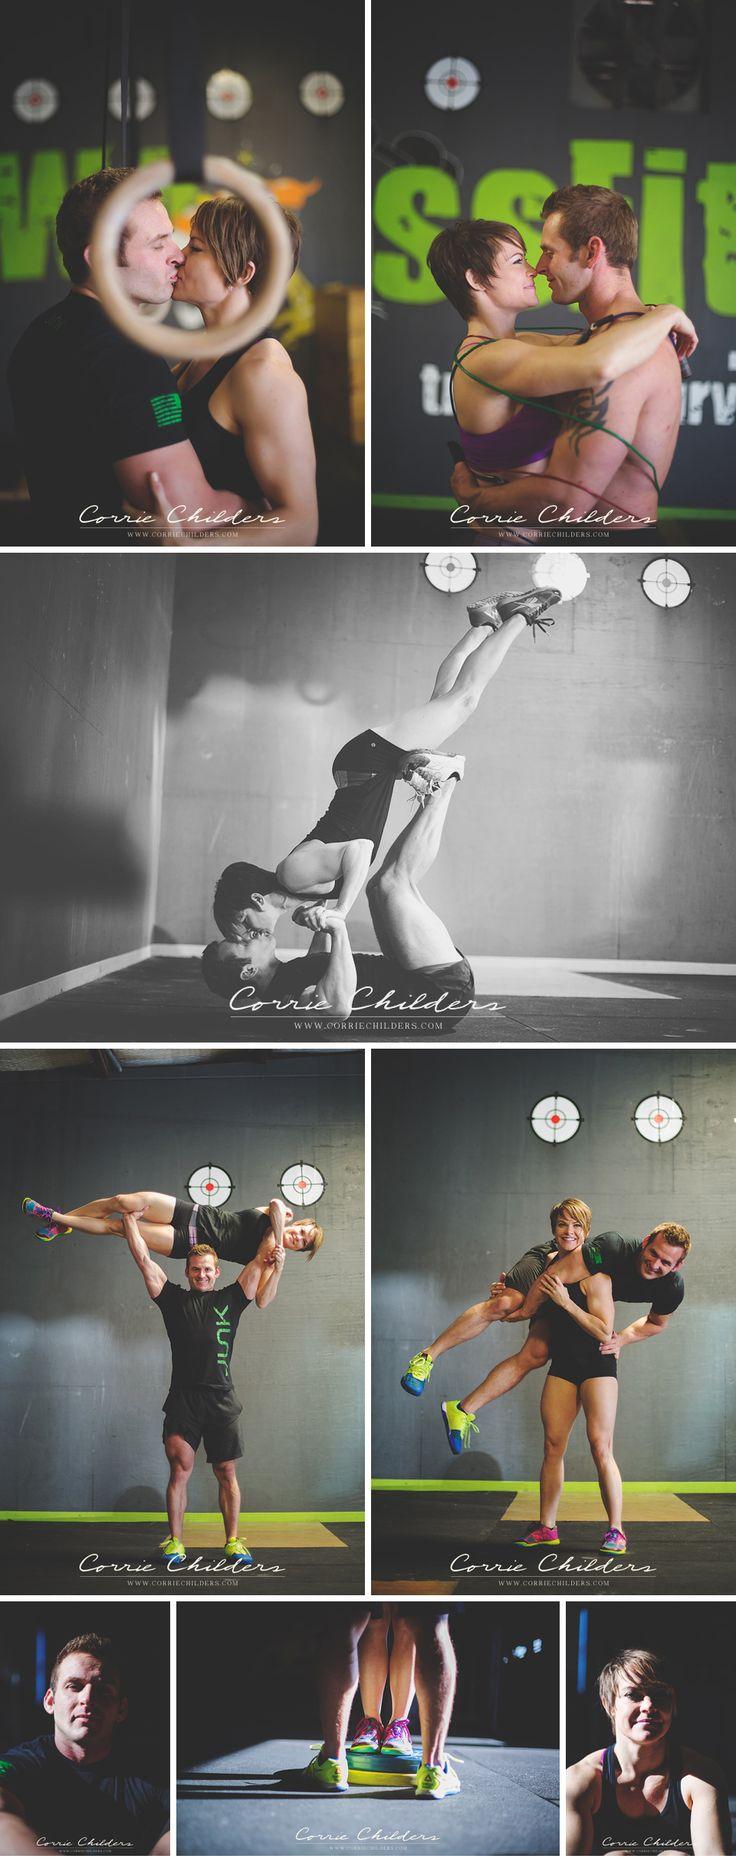 CrossFit Engagement Photos / CrossFit / CrossFit Couple / Swolemates / Wedding Fitness / Buff bride